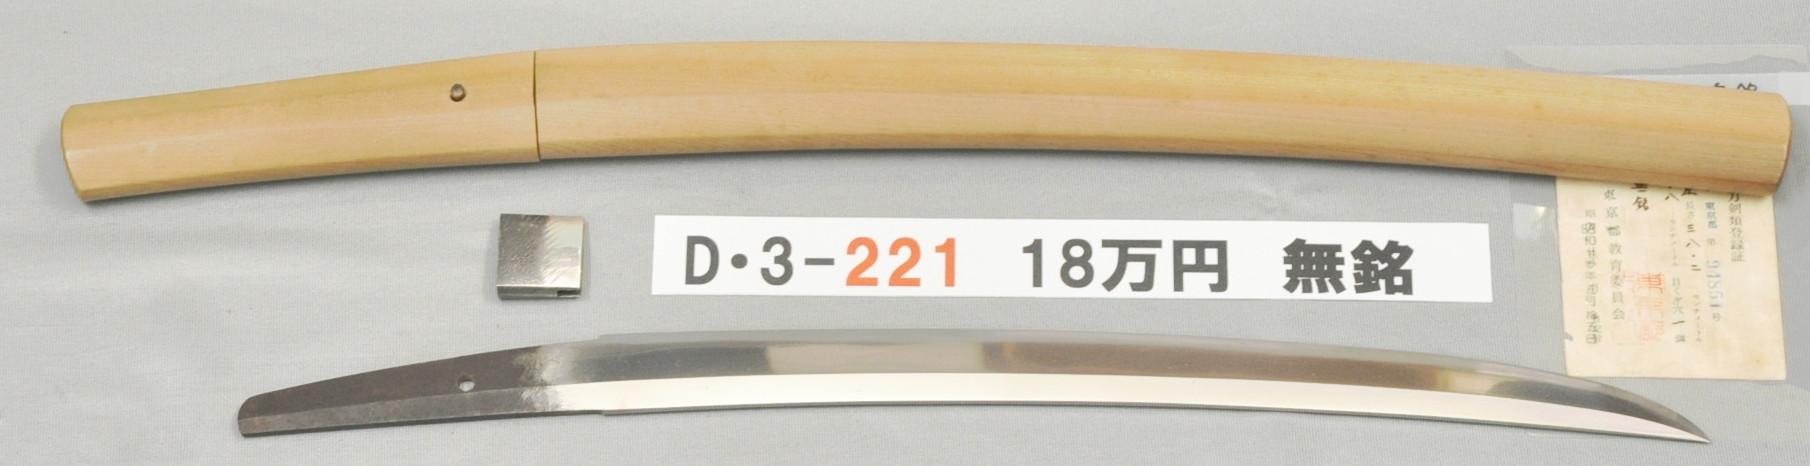 D3221